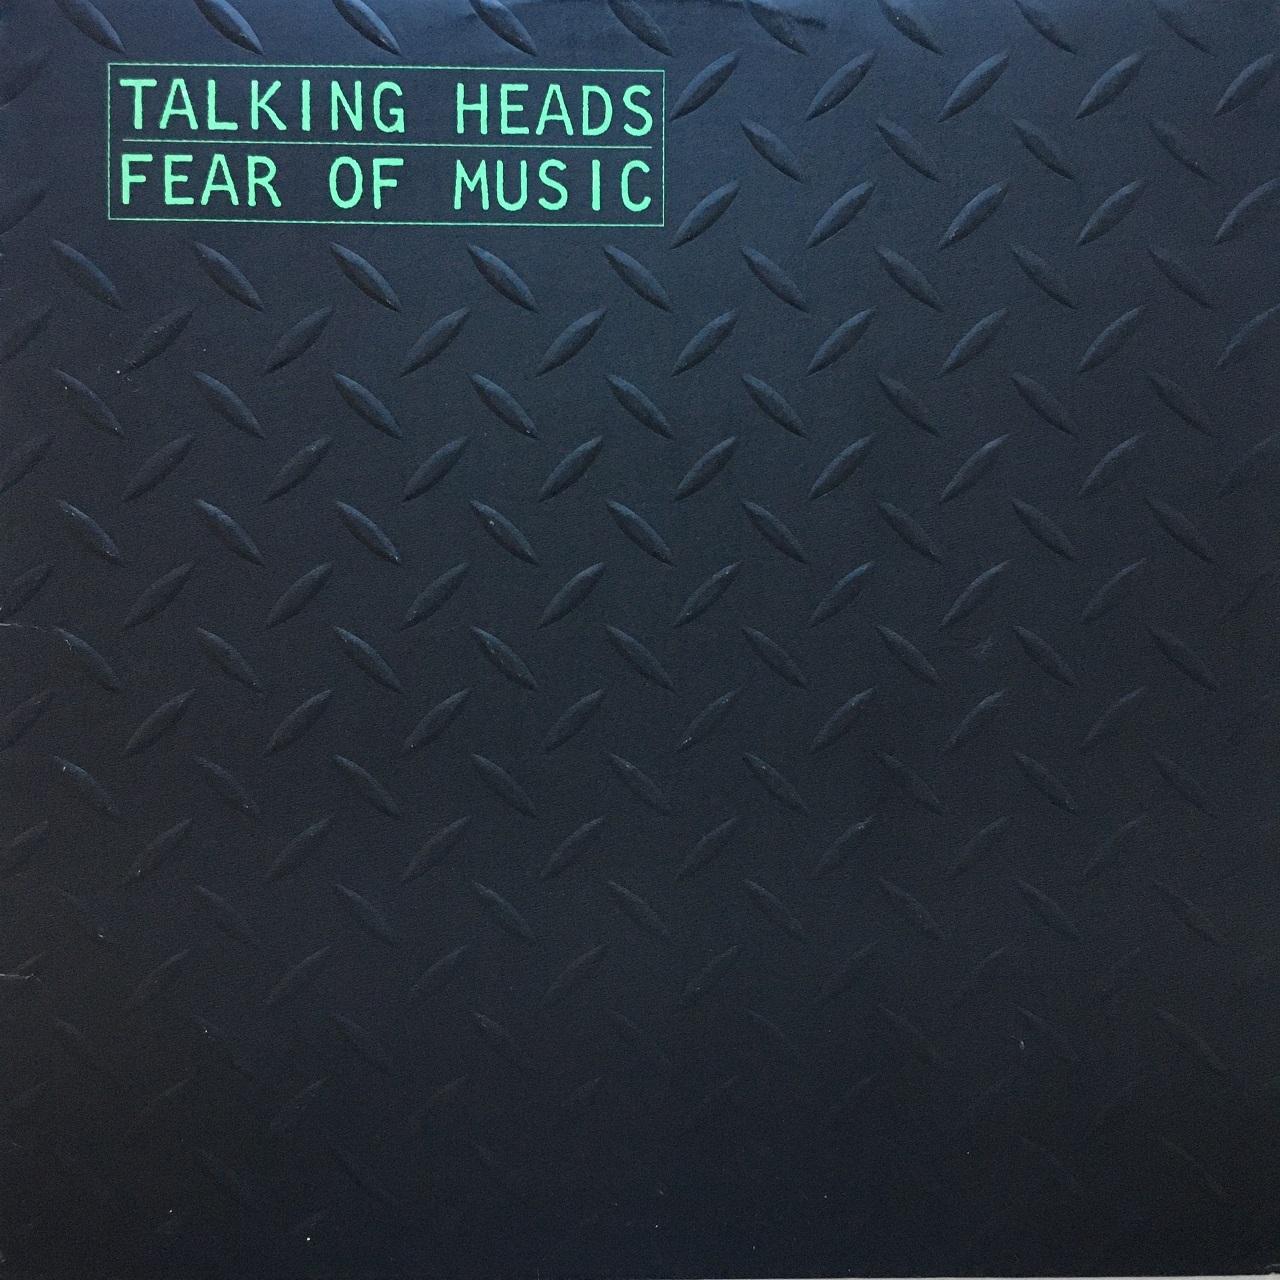 【LP・米盤】Talking Heads / Fear Of Music